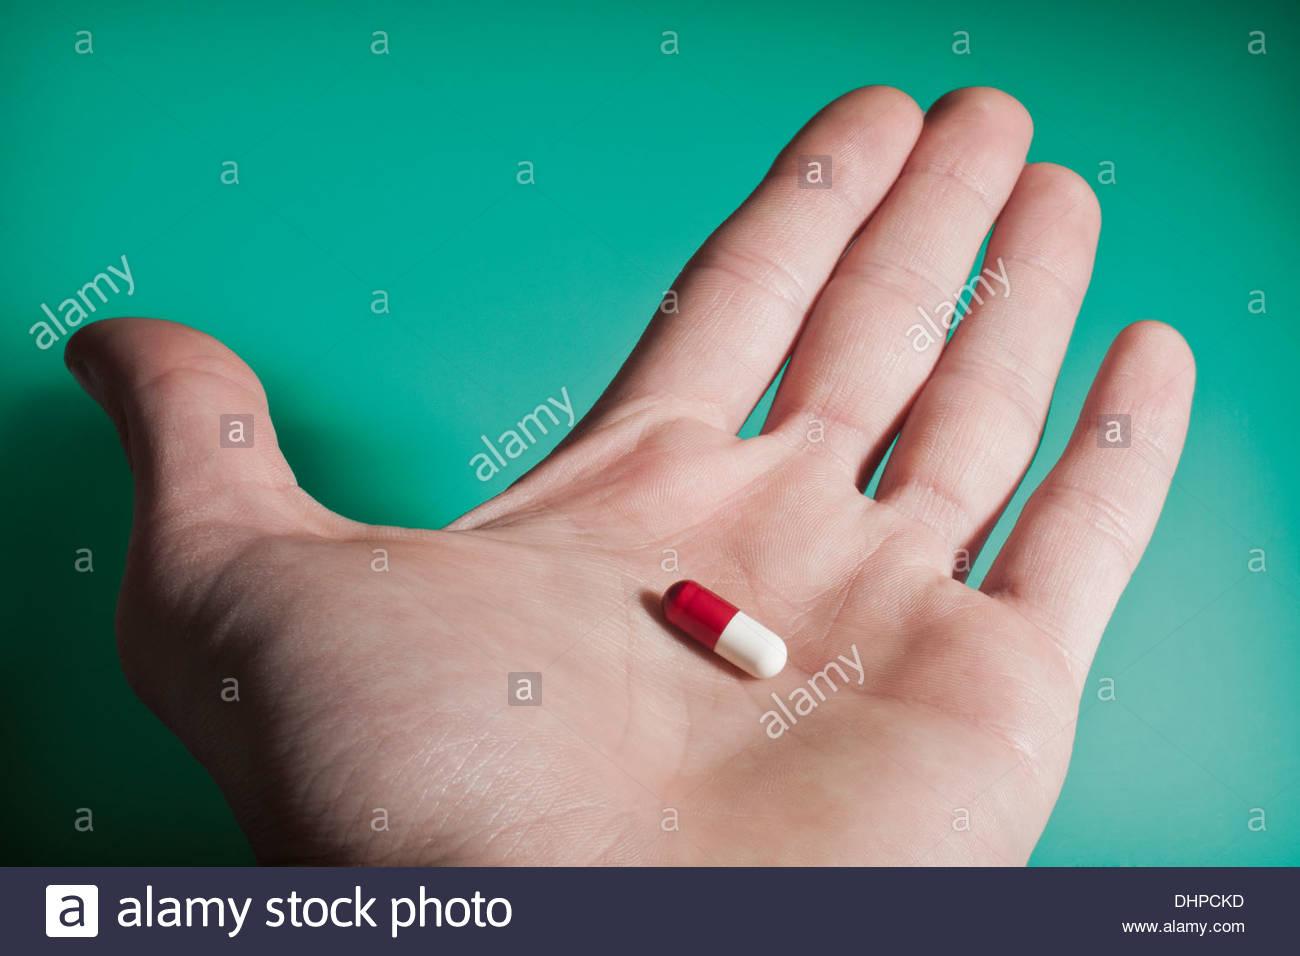 Capsule on hand - Stock Image